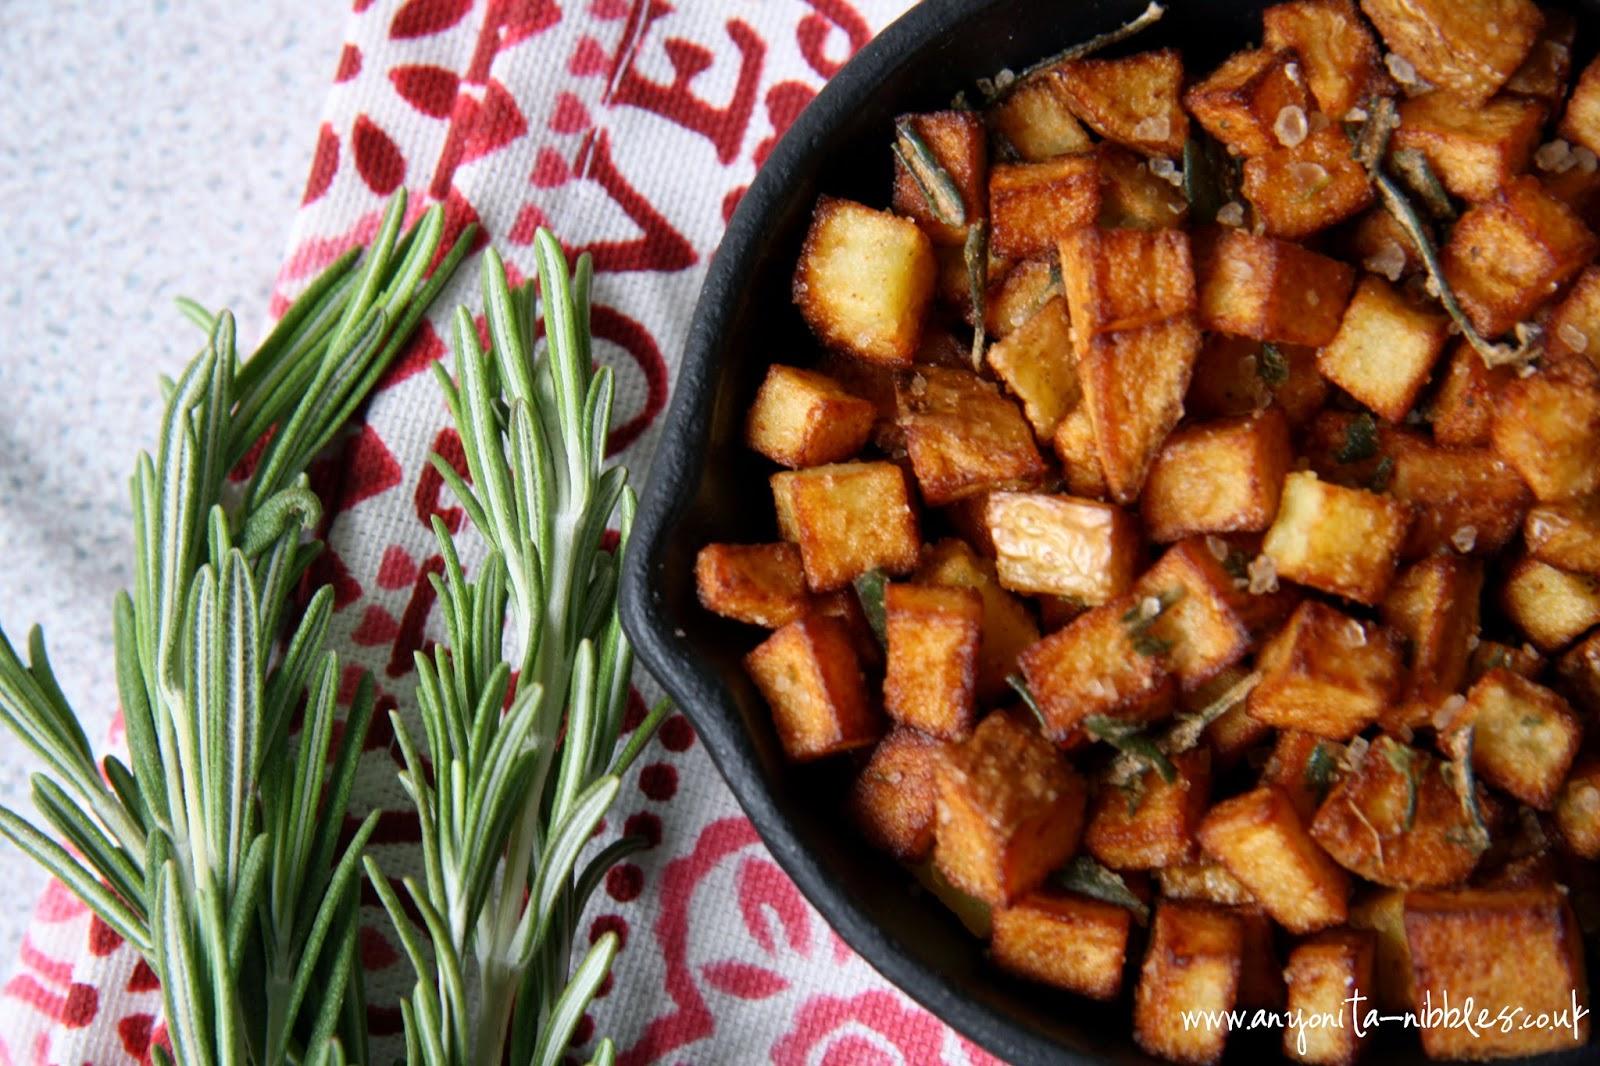 A skillet of rosemary & salt potatoes from www.anyonita-nibbles.co.uk #glutenfree #vegan #vegetarian